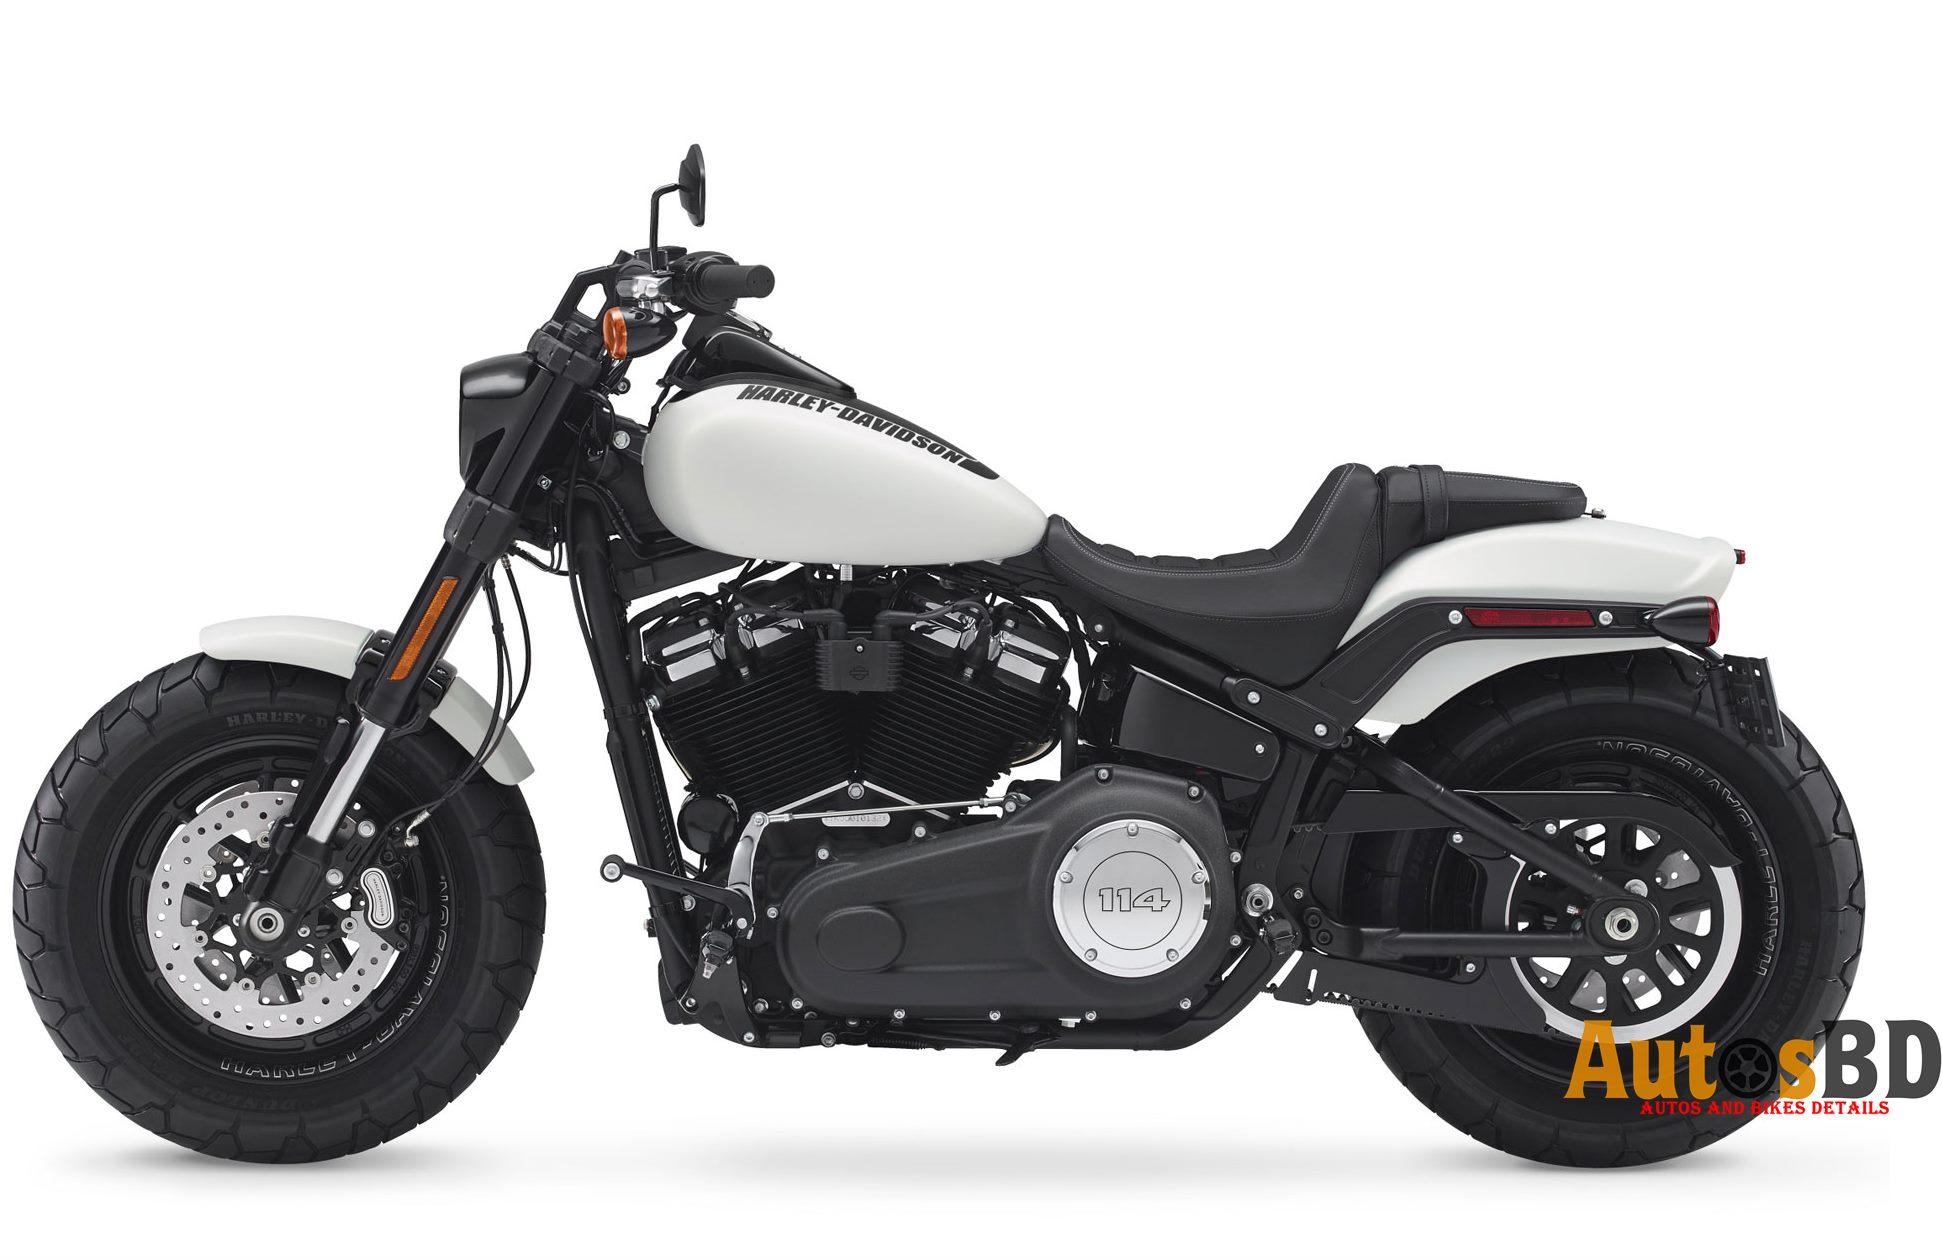 Harley Davidson Fat Bob Motorcycle Specification